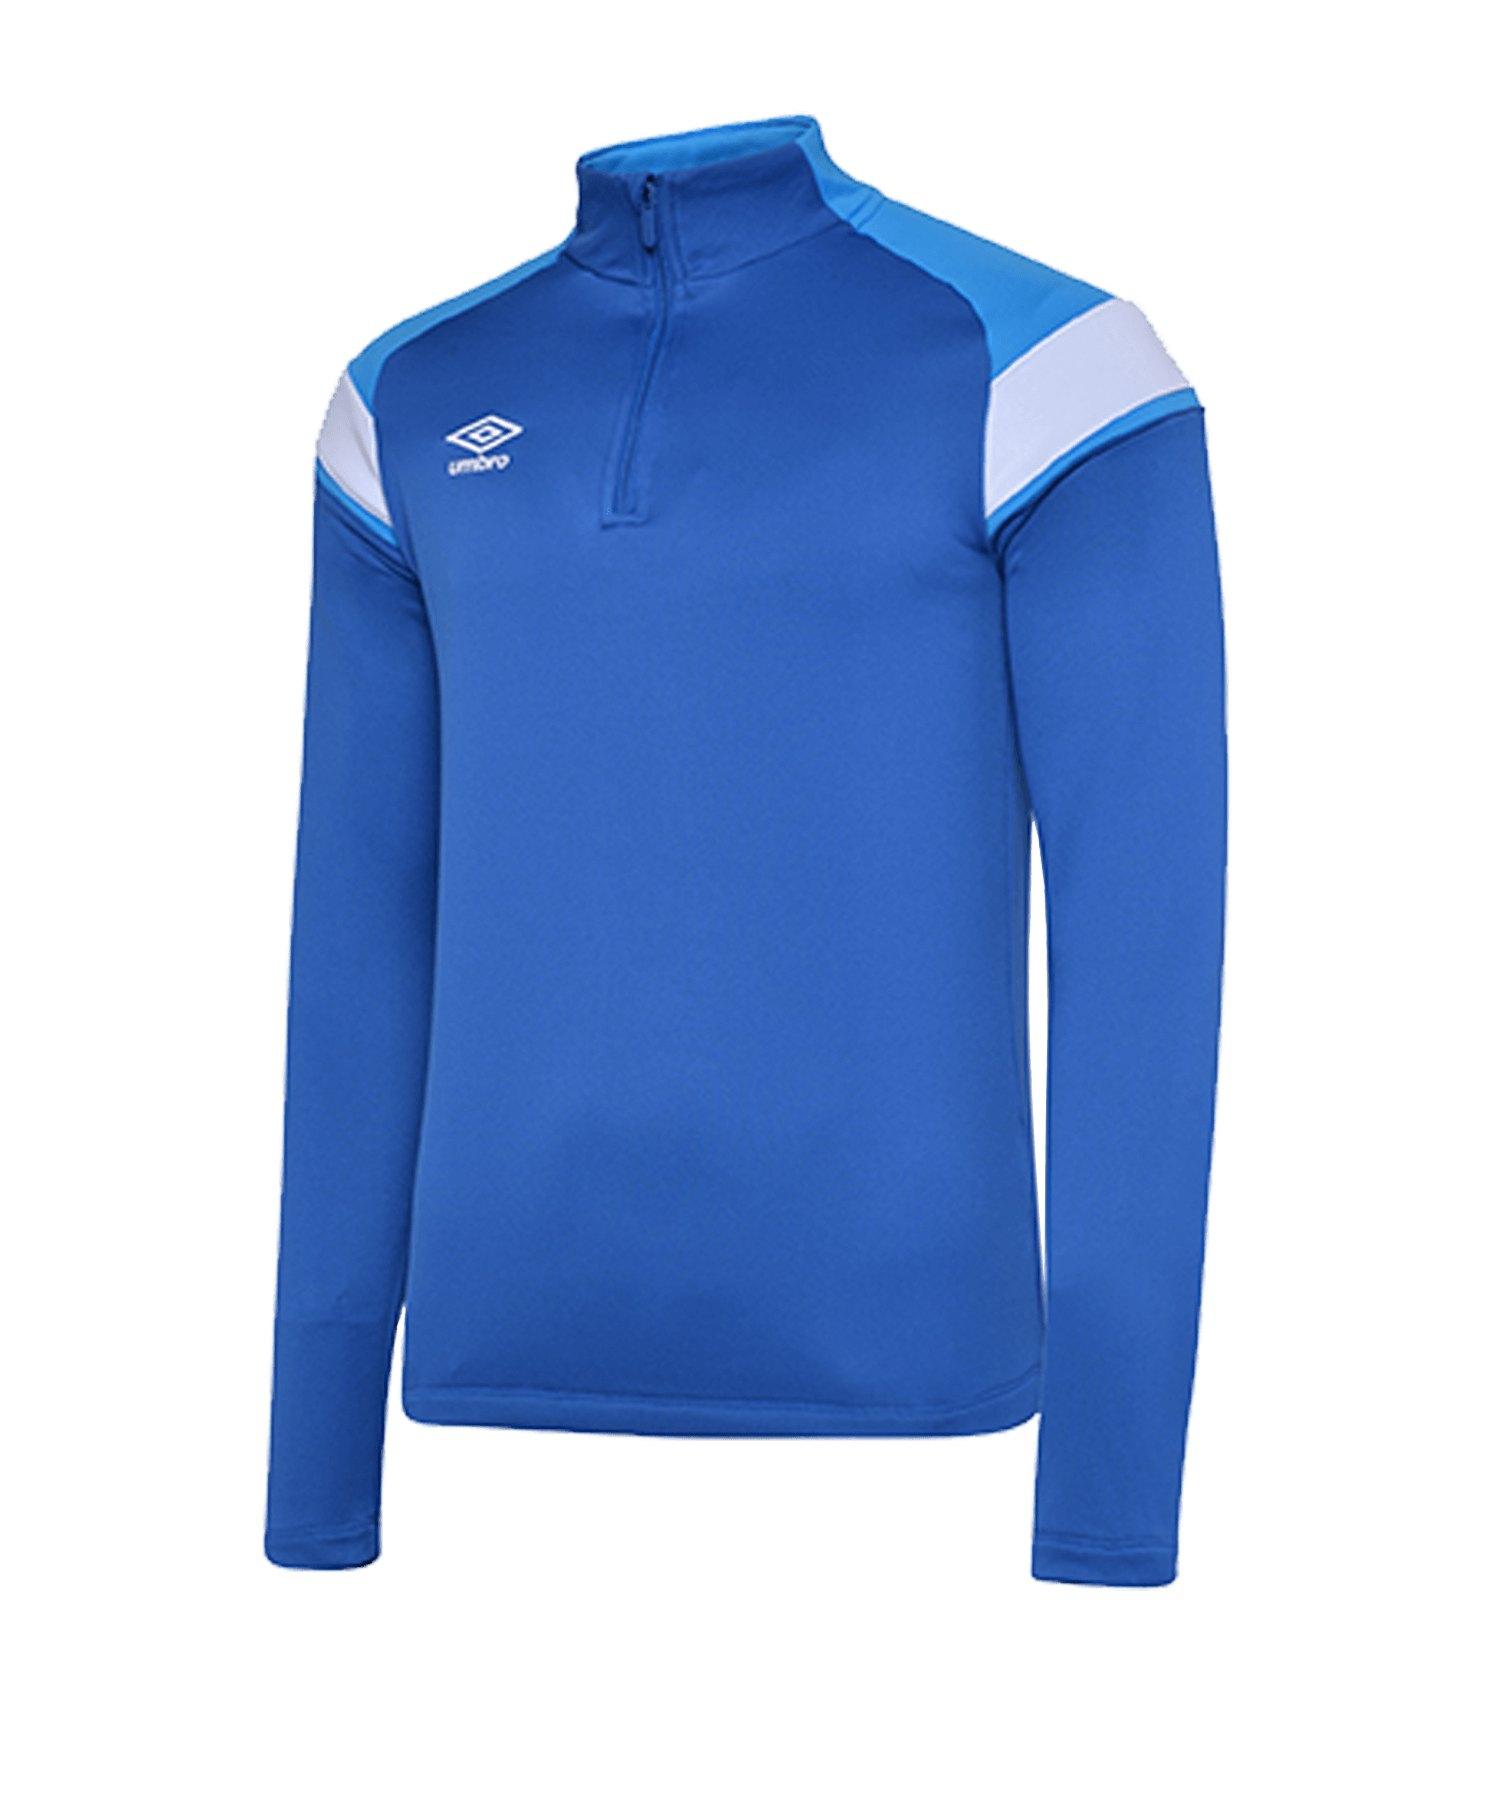 Umbro 1/2 Zip Sweatshirt Blau FGQW - blau